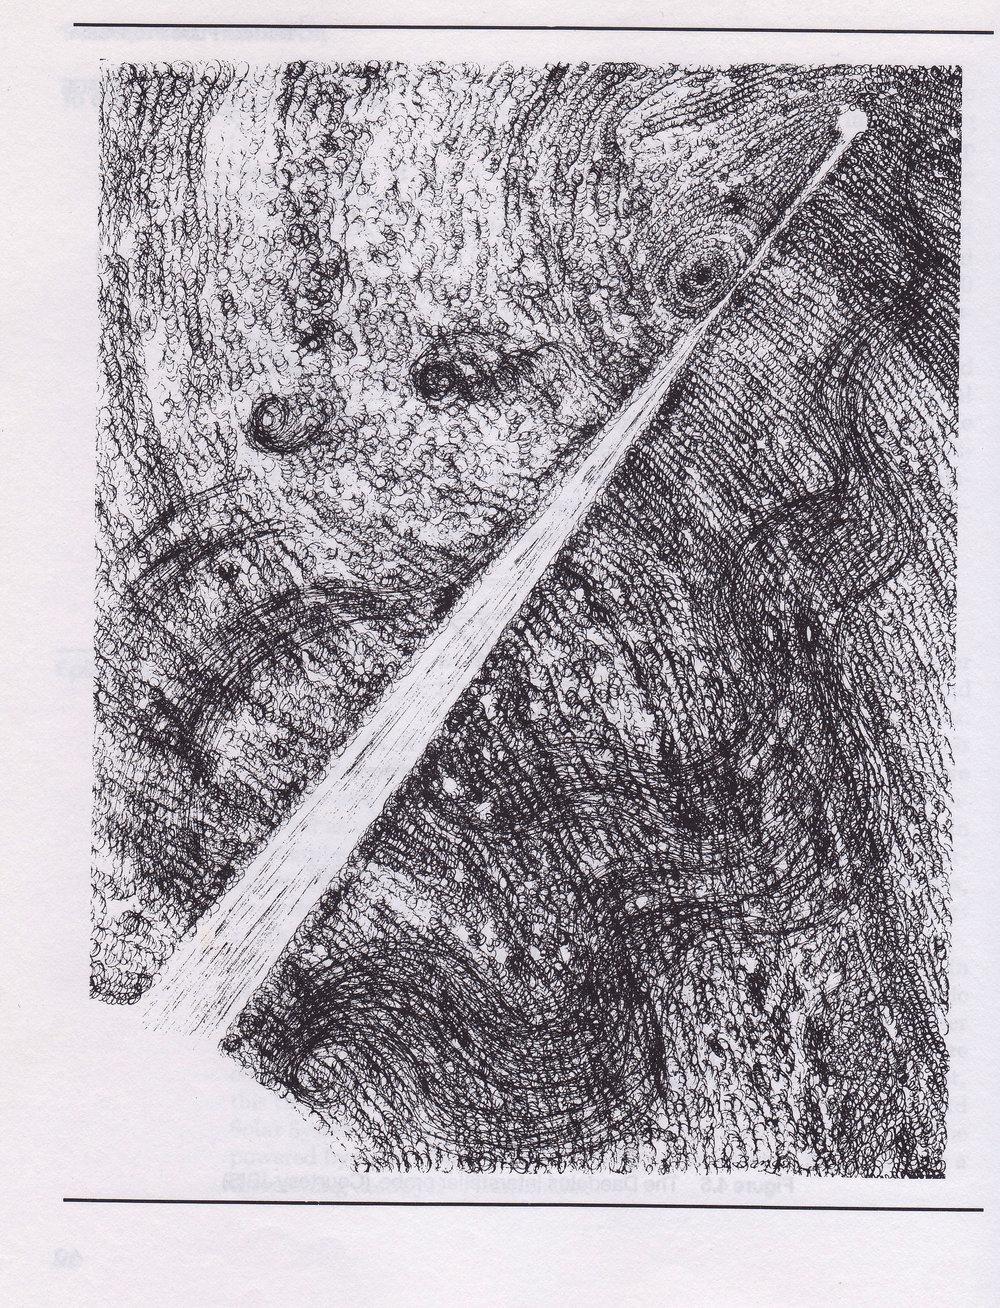 """Beamed"" , by C Bangs, as appears in 'The Starflight Handbook b Greg Matloff'"